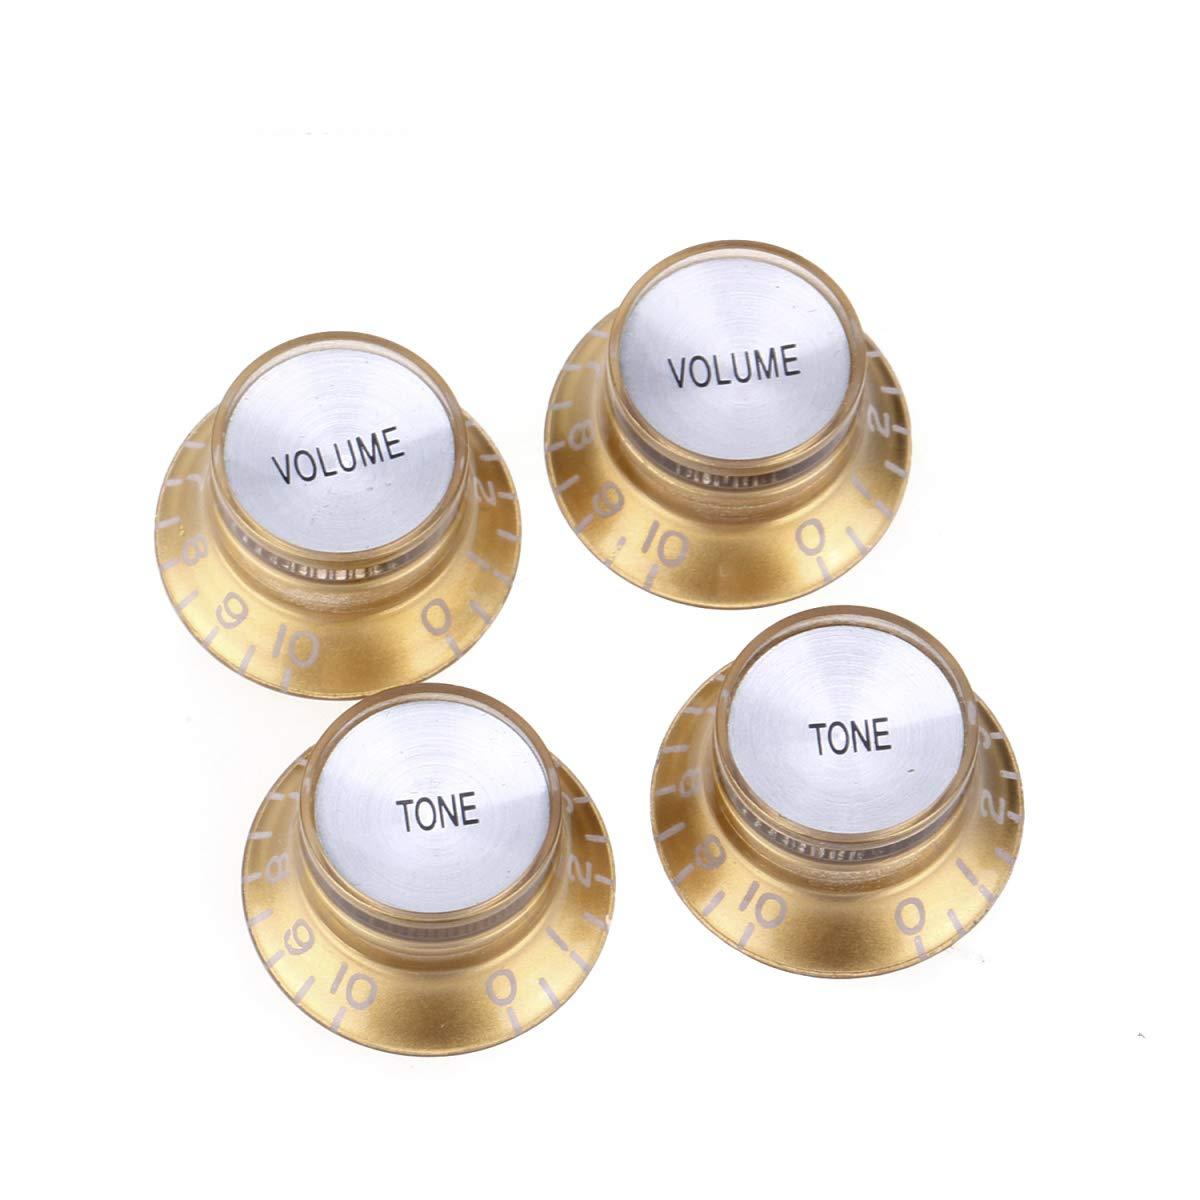 Oro con Plata Top Musiclily Pro Imperial Pulgadas Tama/ño Botones de Potenci/ómetros Reflector 2 Volumen 2 Tono Perillas Set para Guitarra El/éctrica USA Made Les Paul SG